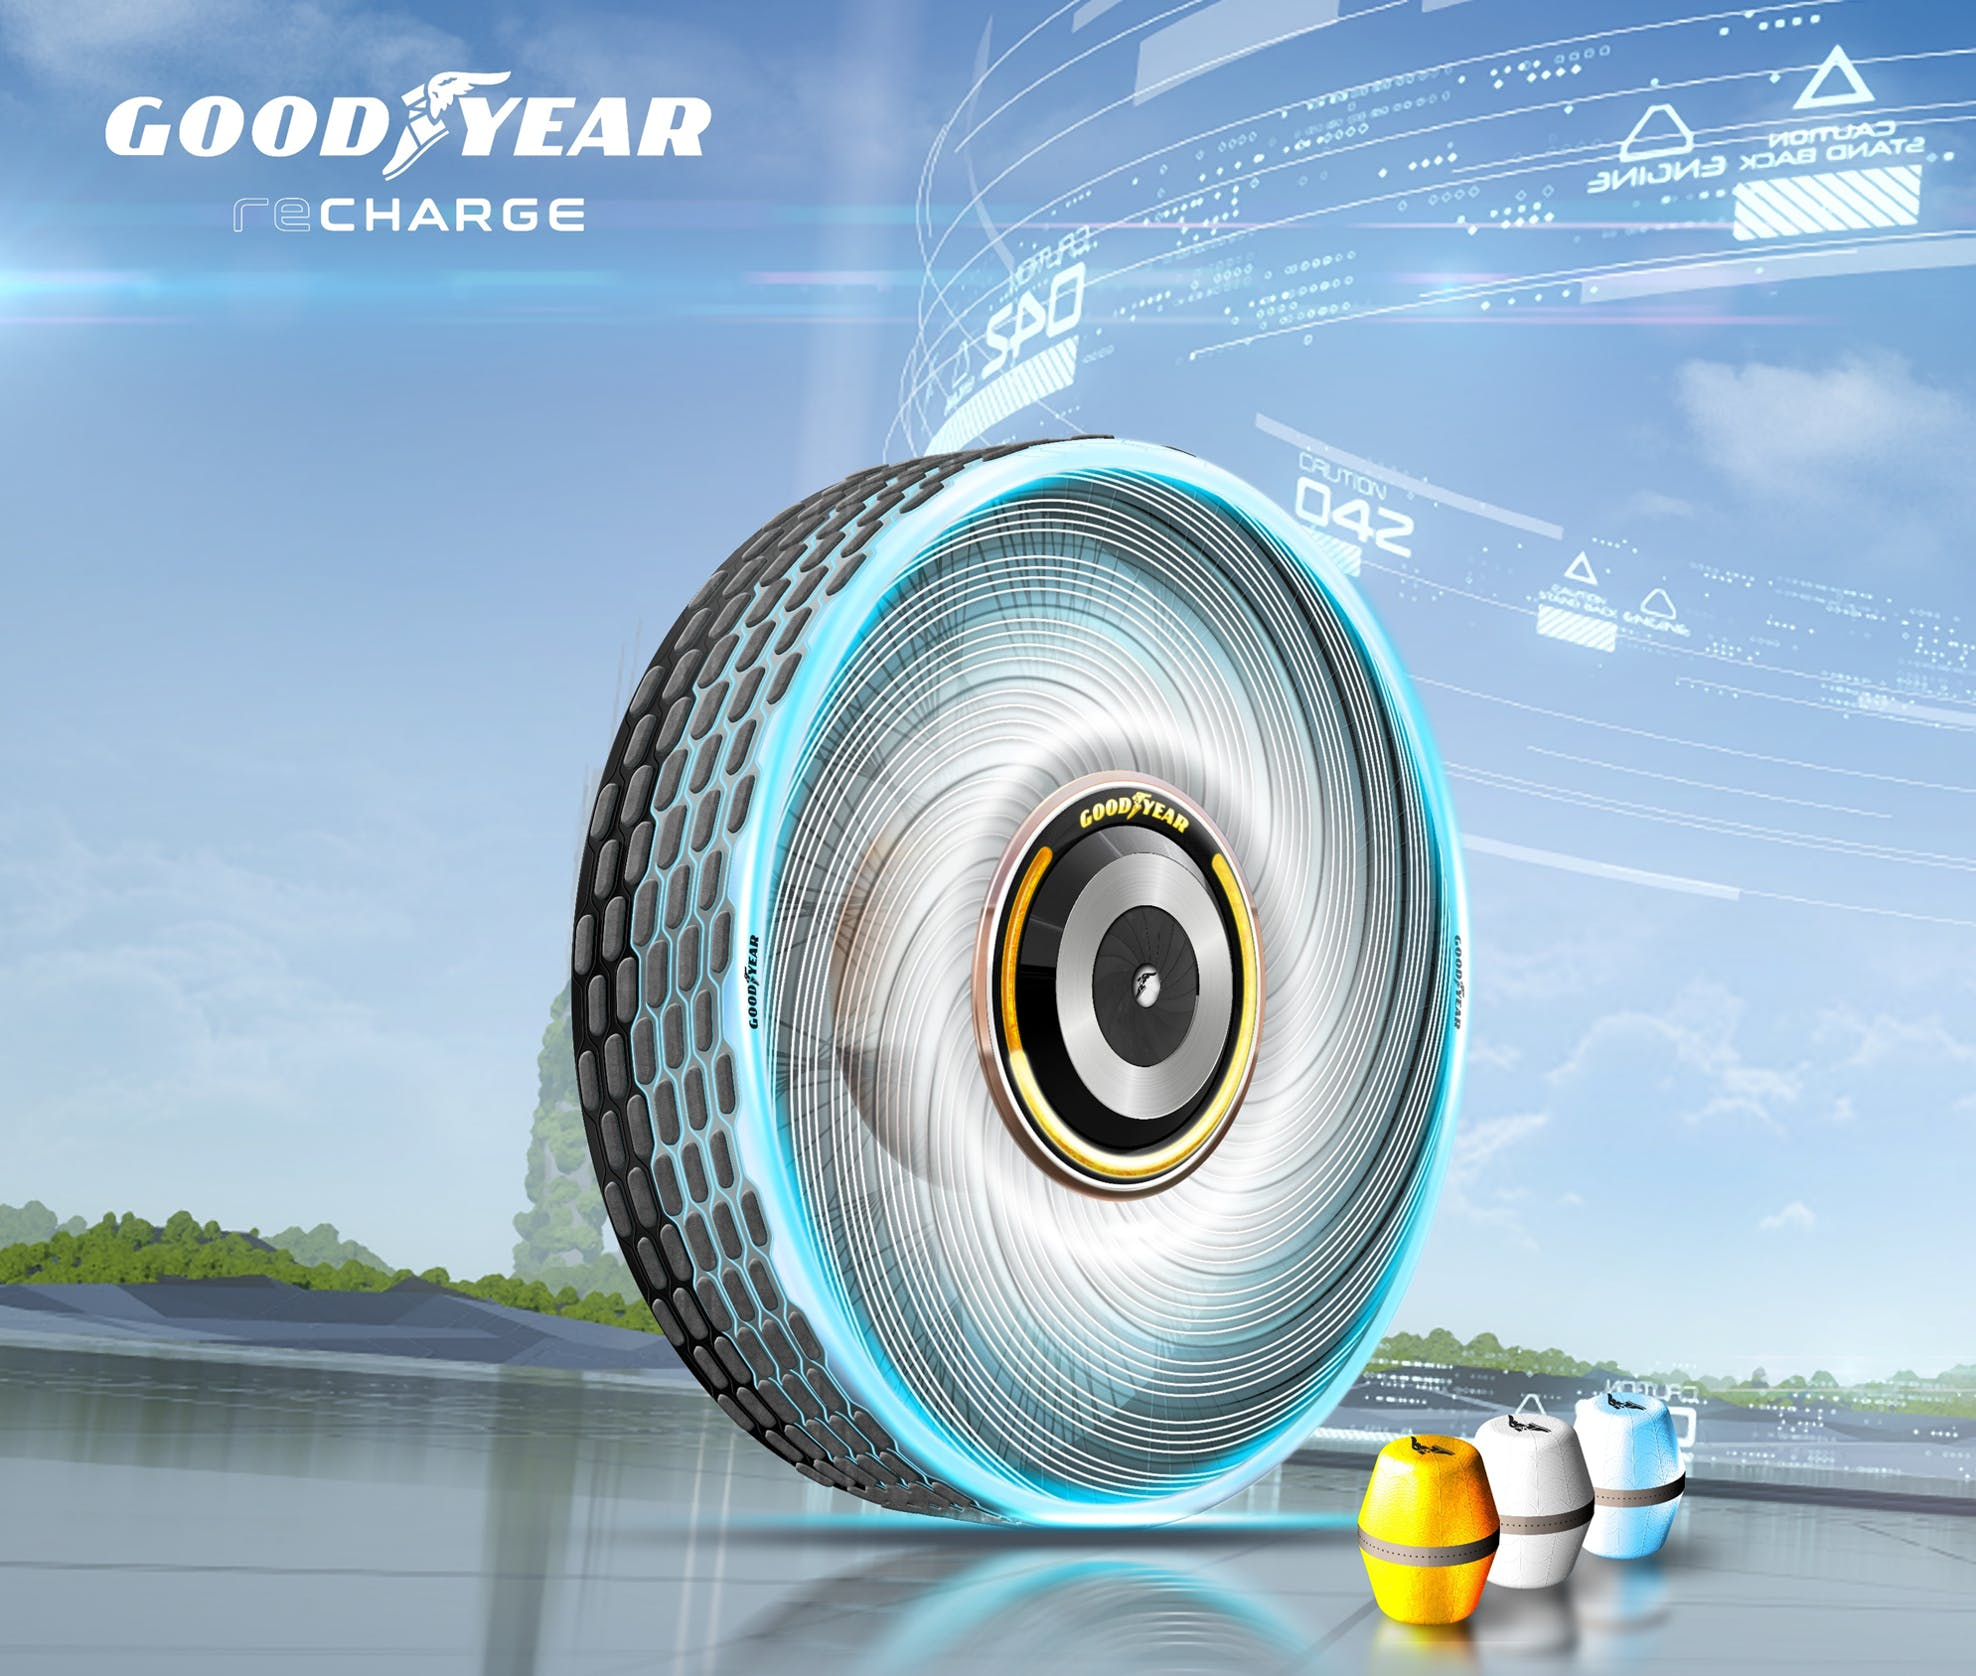 goodyear-conceptrecharge-2